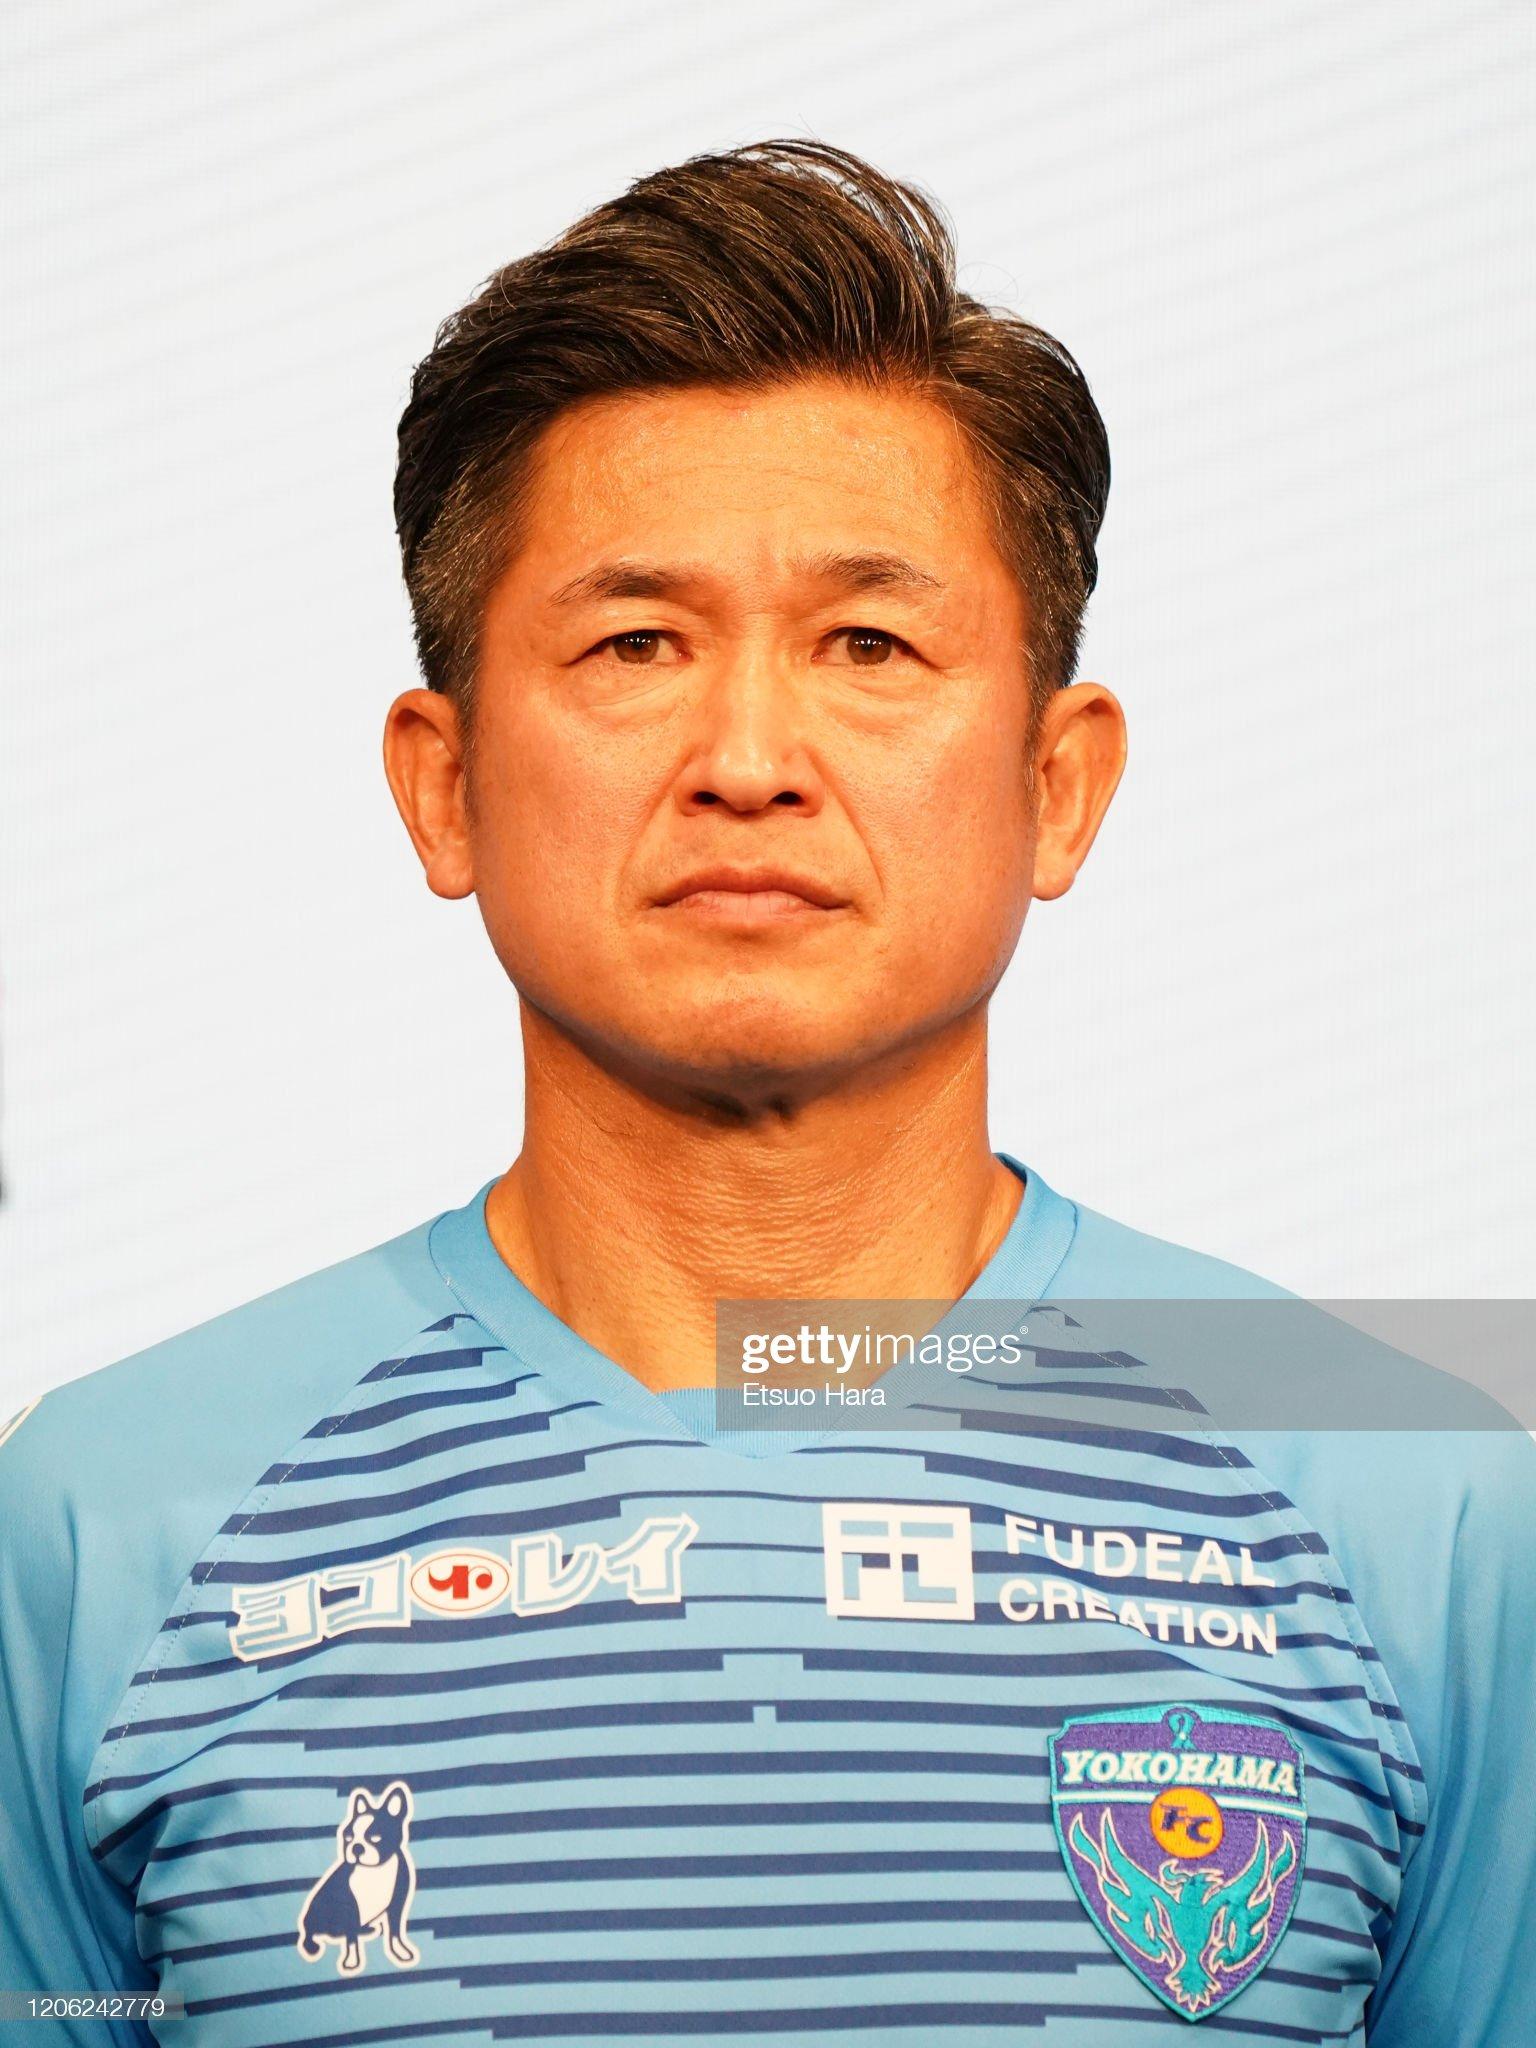 ¿Cuánto mide Kazuyoshi Miura? - Altura - Real height Kazuyoshi-miura-of-yokohama-fc-looks-on-during-the-jleague-kick-off-picture-id1206242779?s=2048x2048